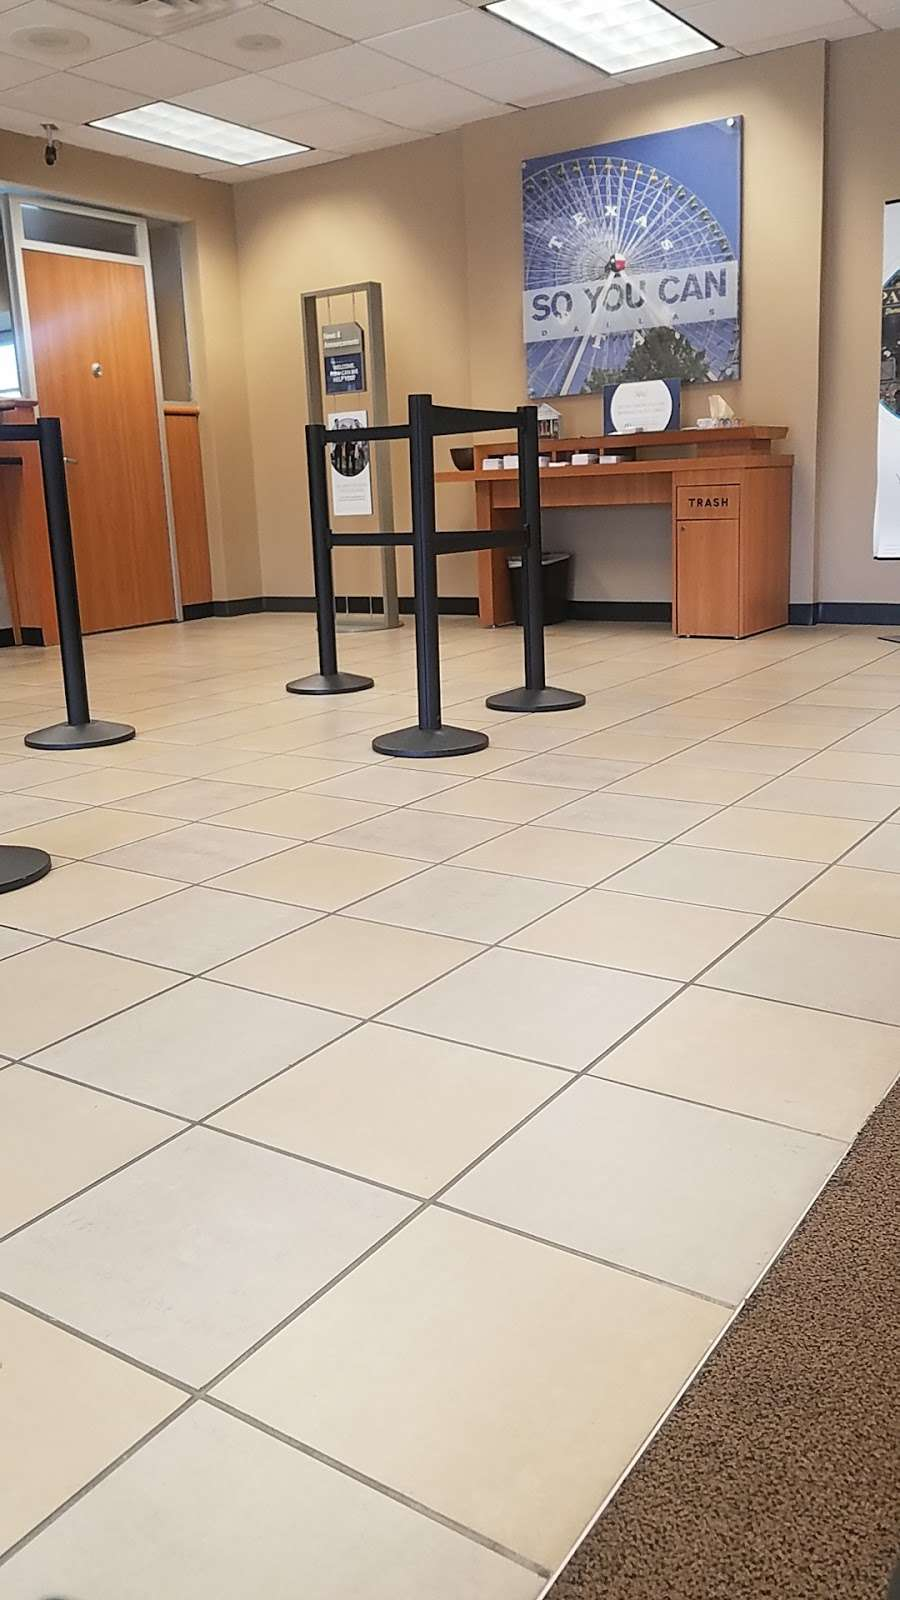 Chase Bank - bank  | Photo 9 of 10 | Address: 14250 Marsh Ln, Addison, TX 75001, USA | Phone: (972) 488-0066